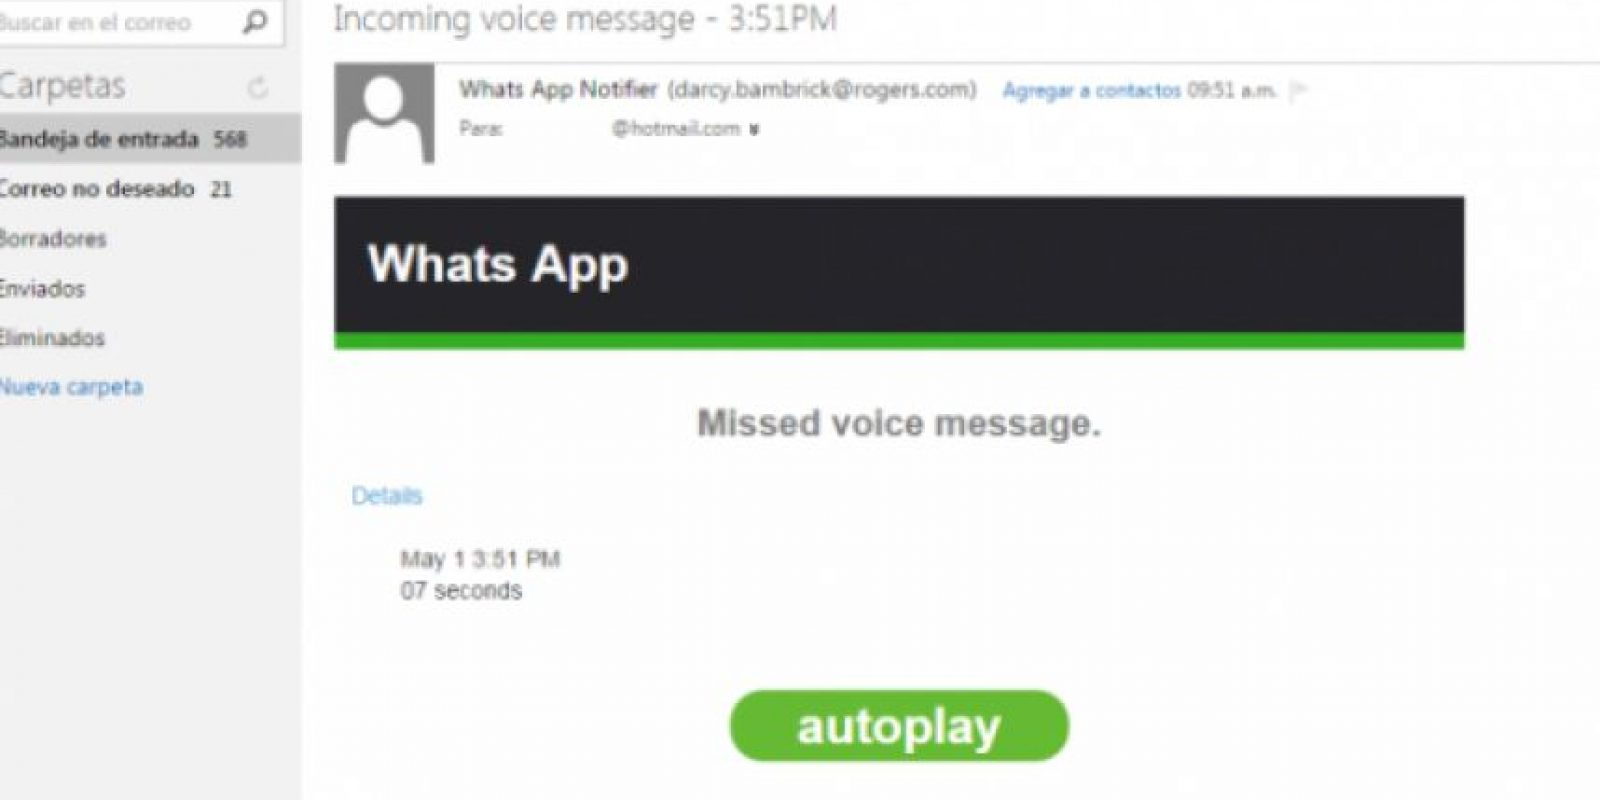 Así luce el correo electrónico falso que usa a WhatsApp como anzuelo para una estafa Foto:Redes Zone